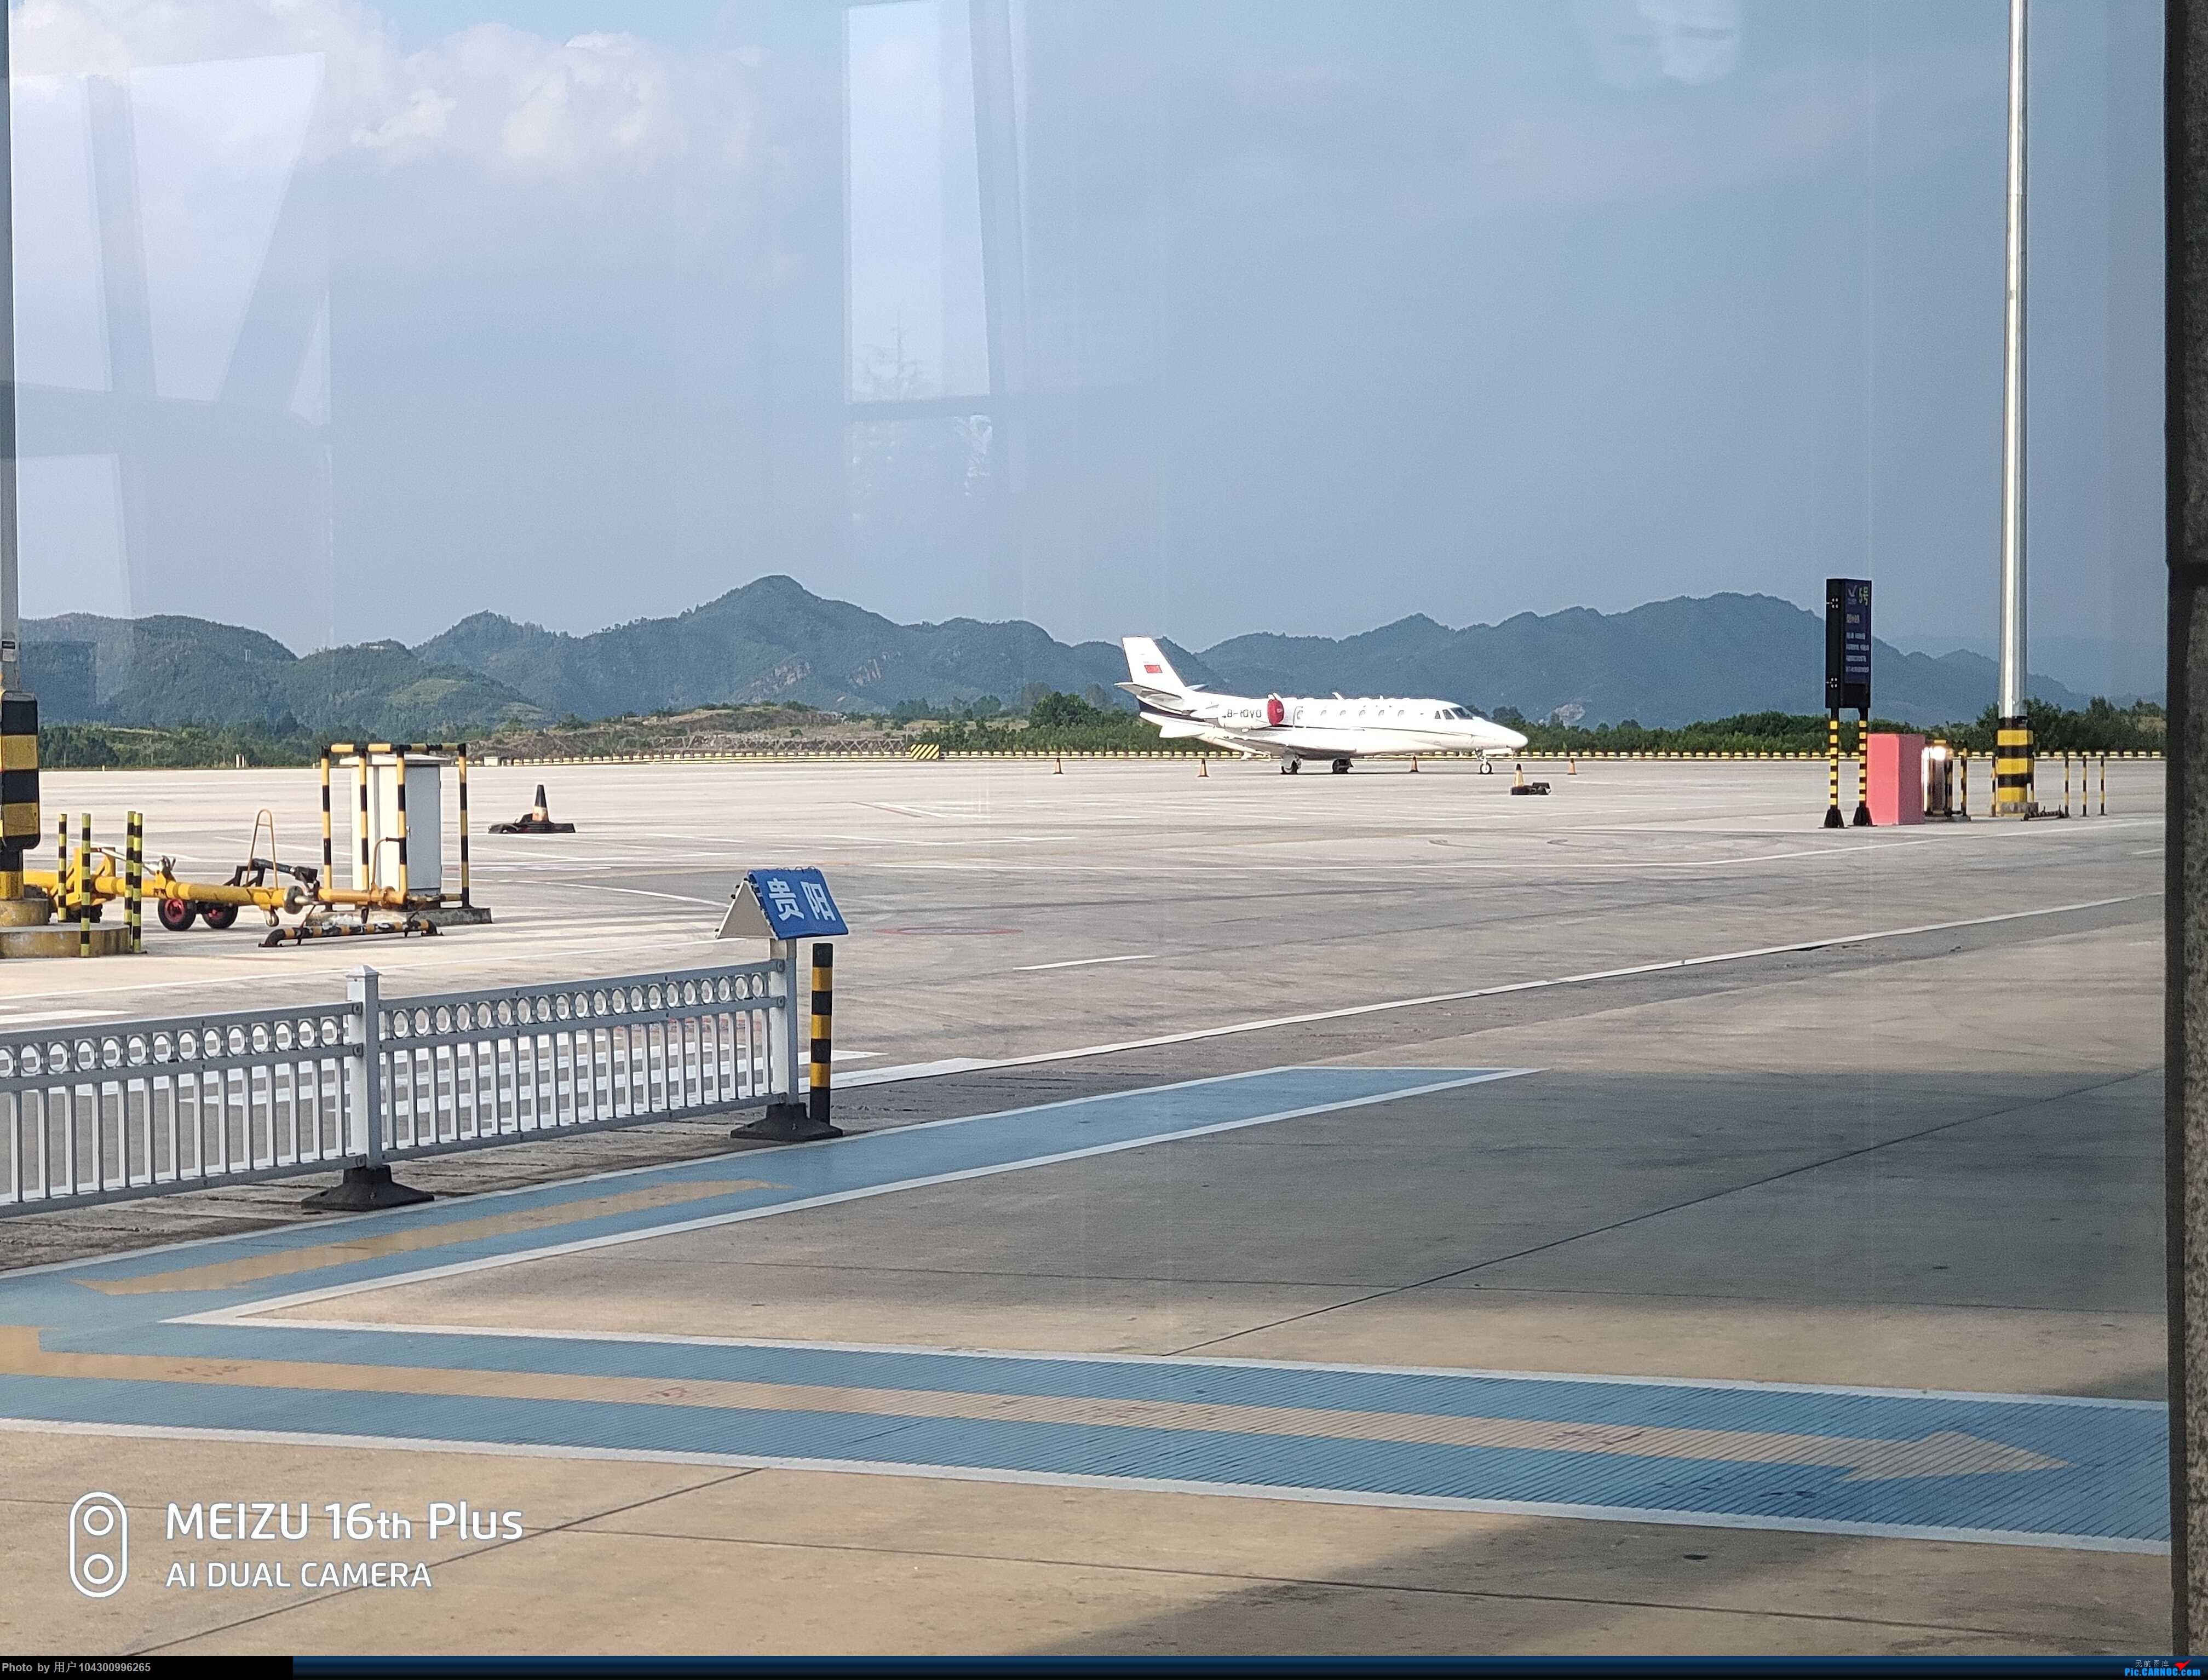 Re:[原创]DM游记之G5毕节--贵阳   中国毕节飞雄机场 中国毕节飞雄机场